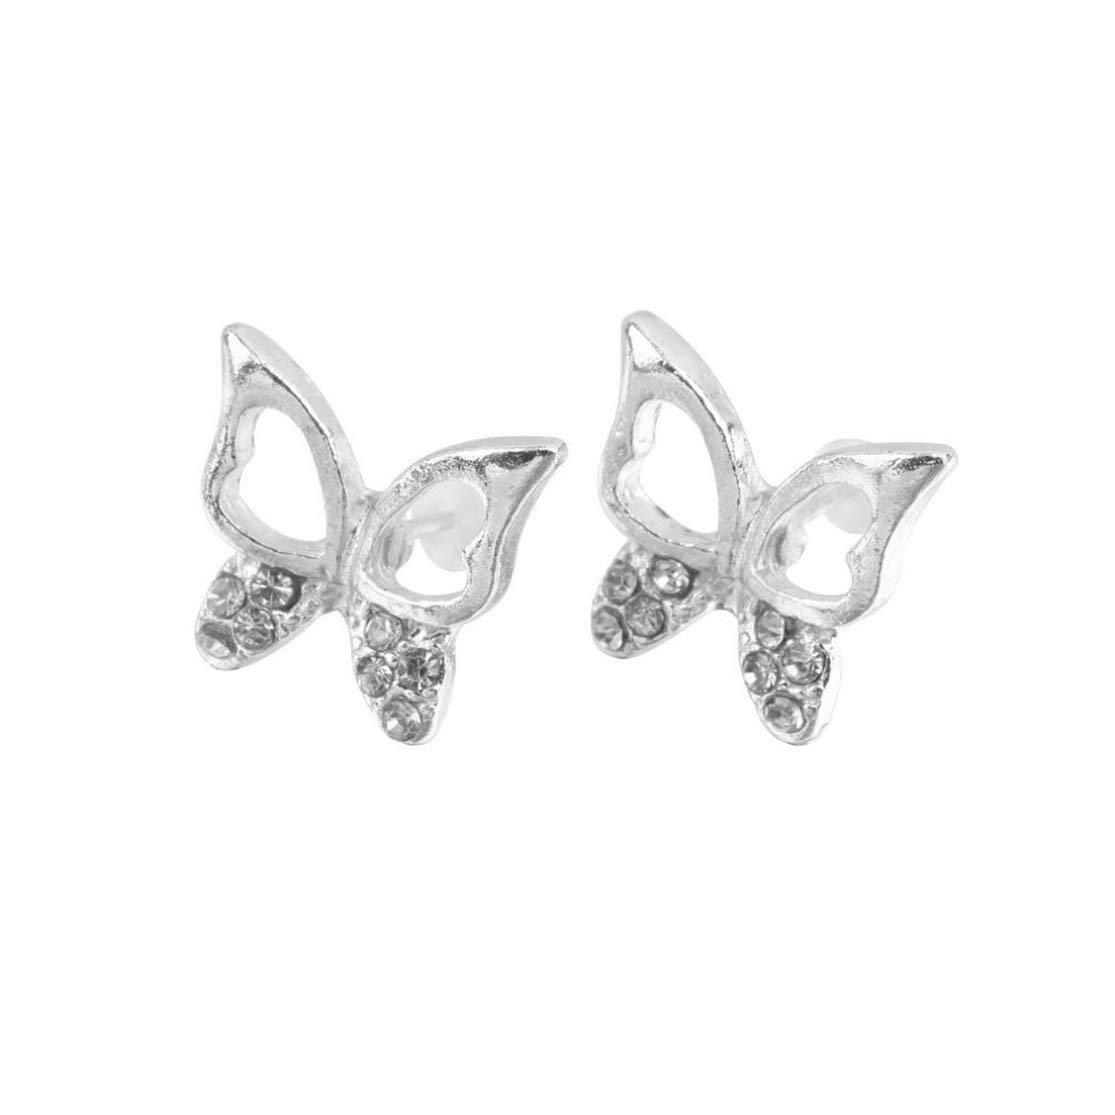 LouiseEvel215 3 pair Fashion Cute Ladies Girls Rhinestone Butterfly Ear Stud Earrings Jewelry Gift brand and Wedding